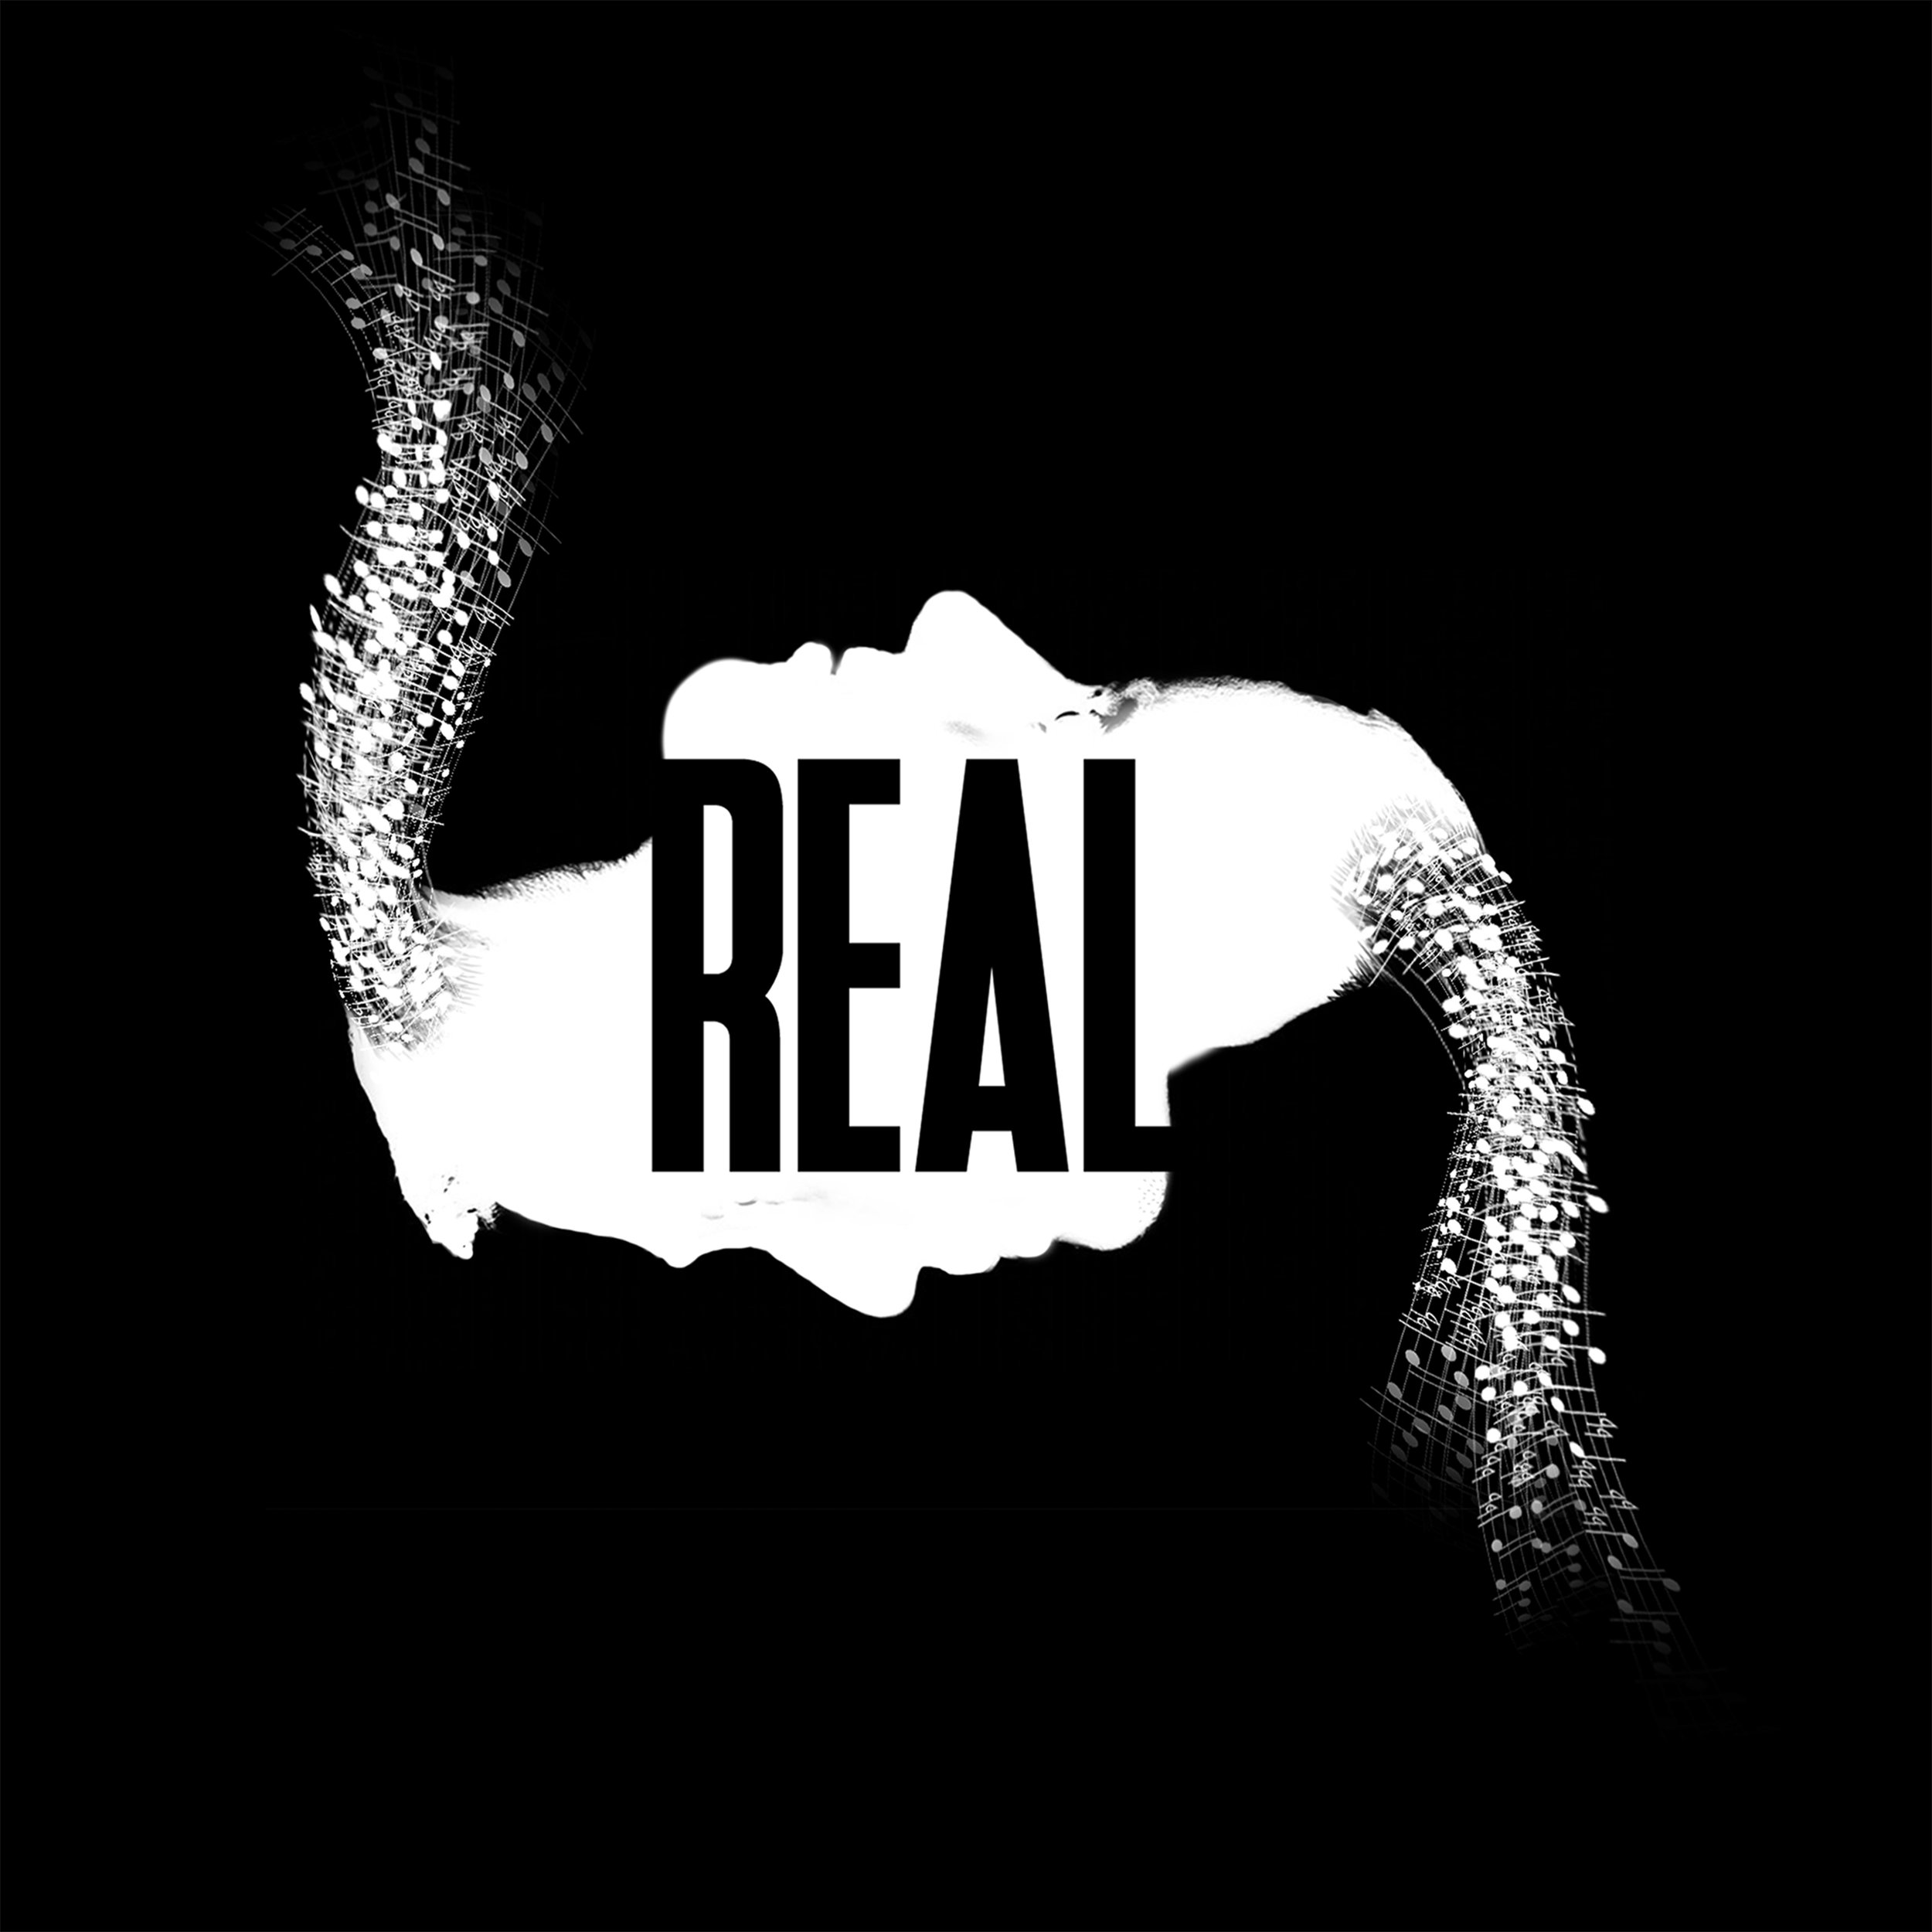 REAL - BY RODRIGO NOGUEIRADIRECTED BY ERIN ORTMANJAN 3 - 20, 2019